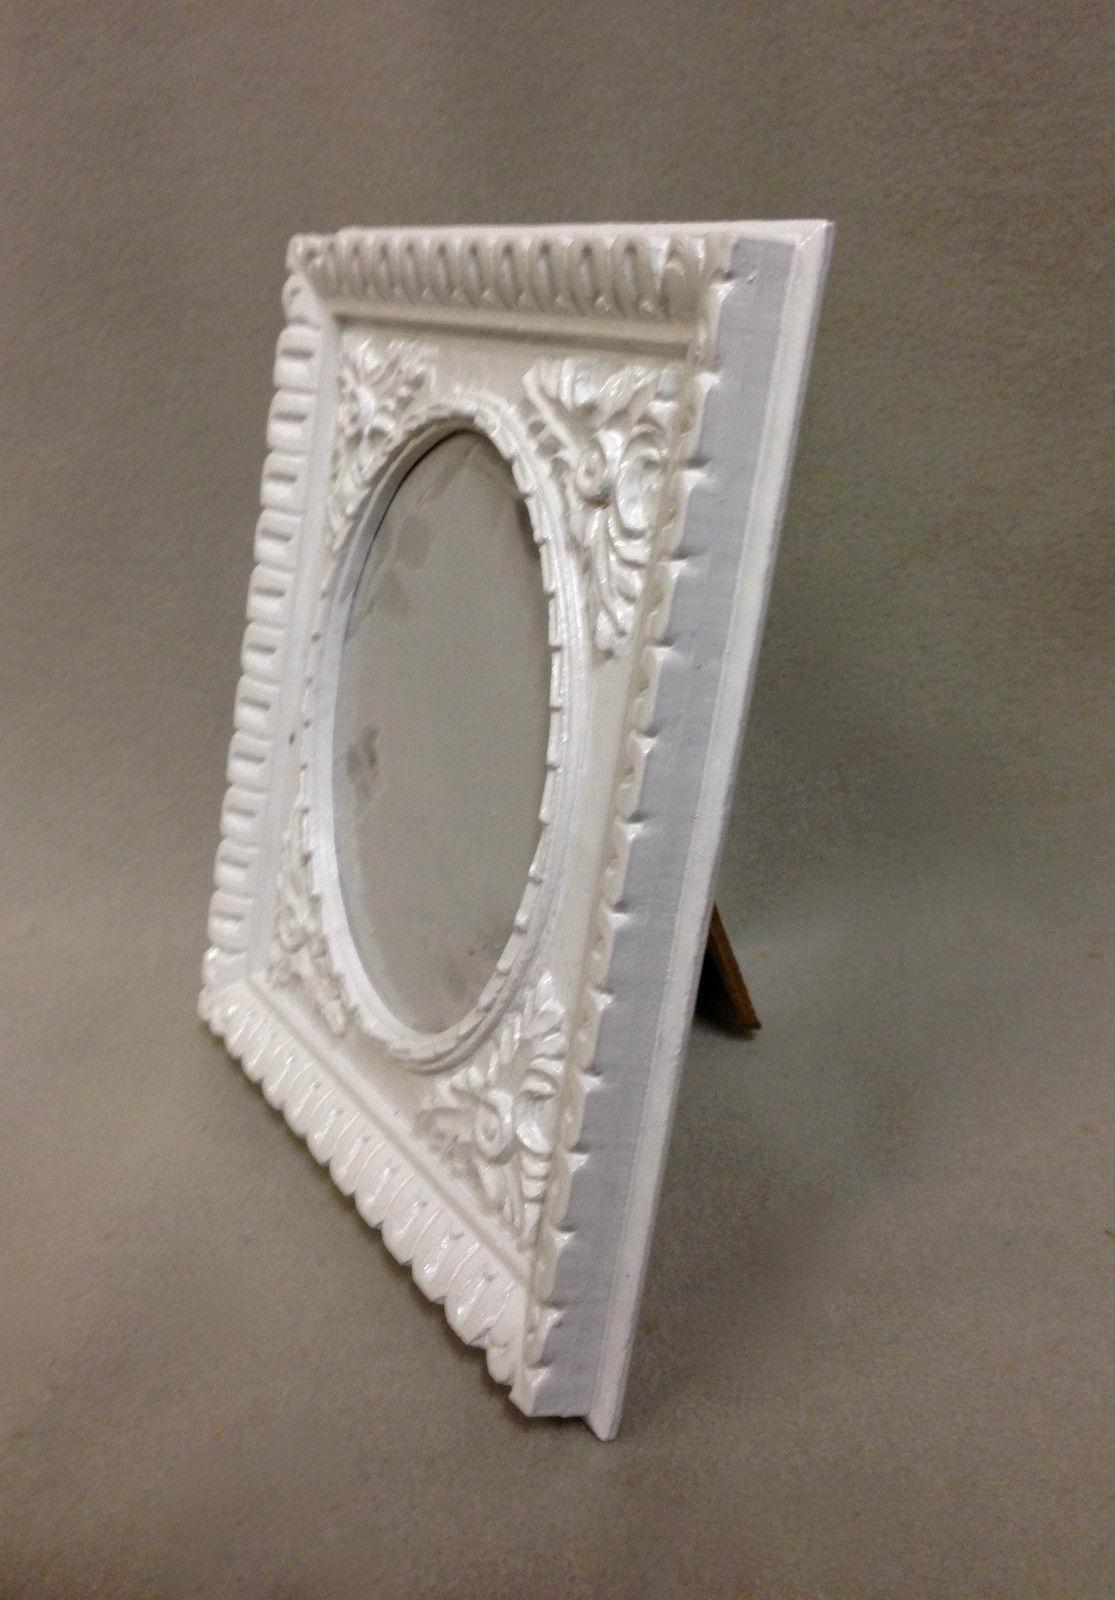 Bilderrahmen Weiß Oval Antik Barockrahmen Fotorahmen Rechteckig ...